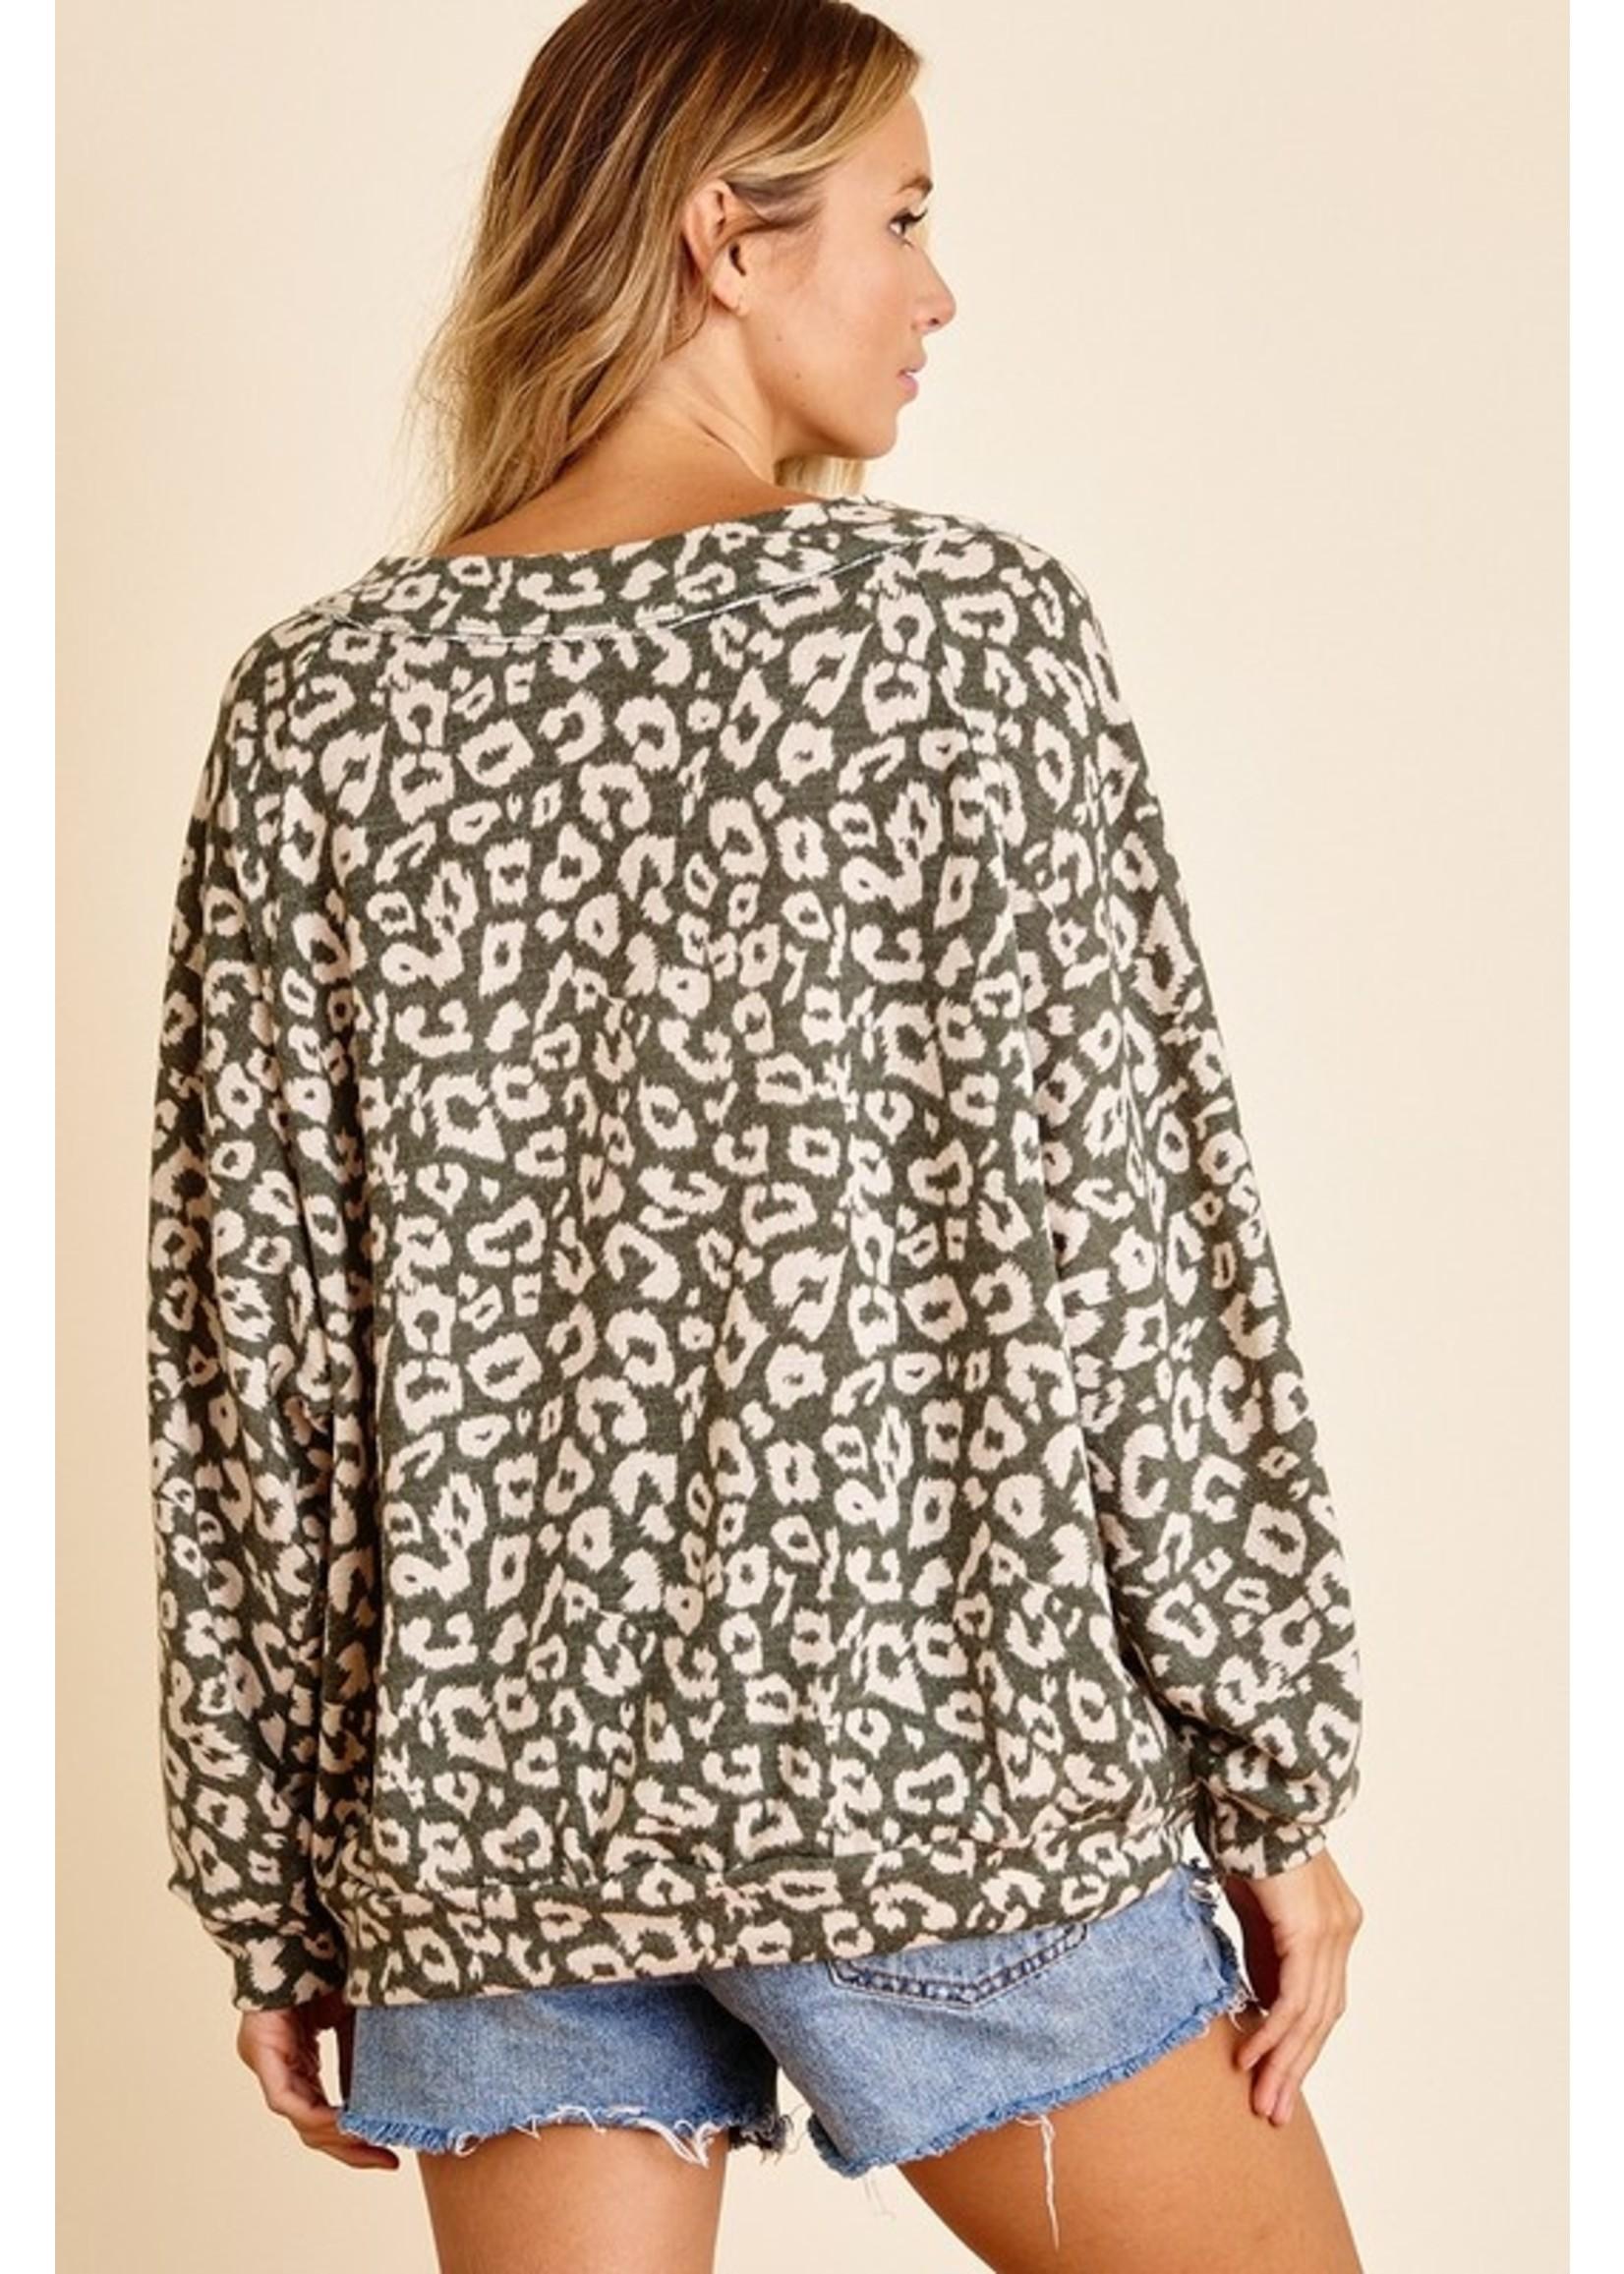 Ces Femme Print Raw Edge Long Sleeve Top